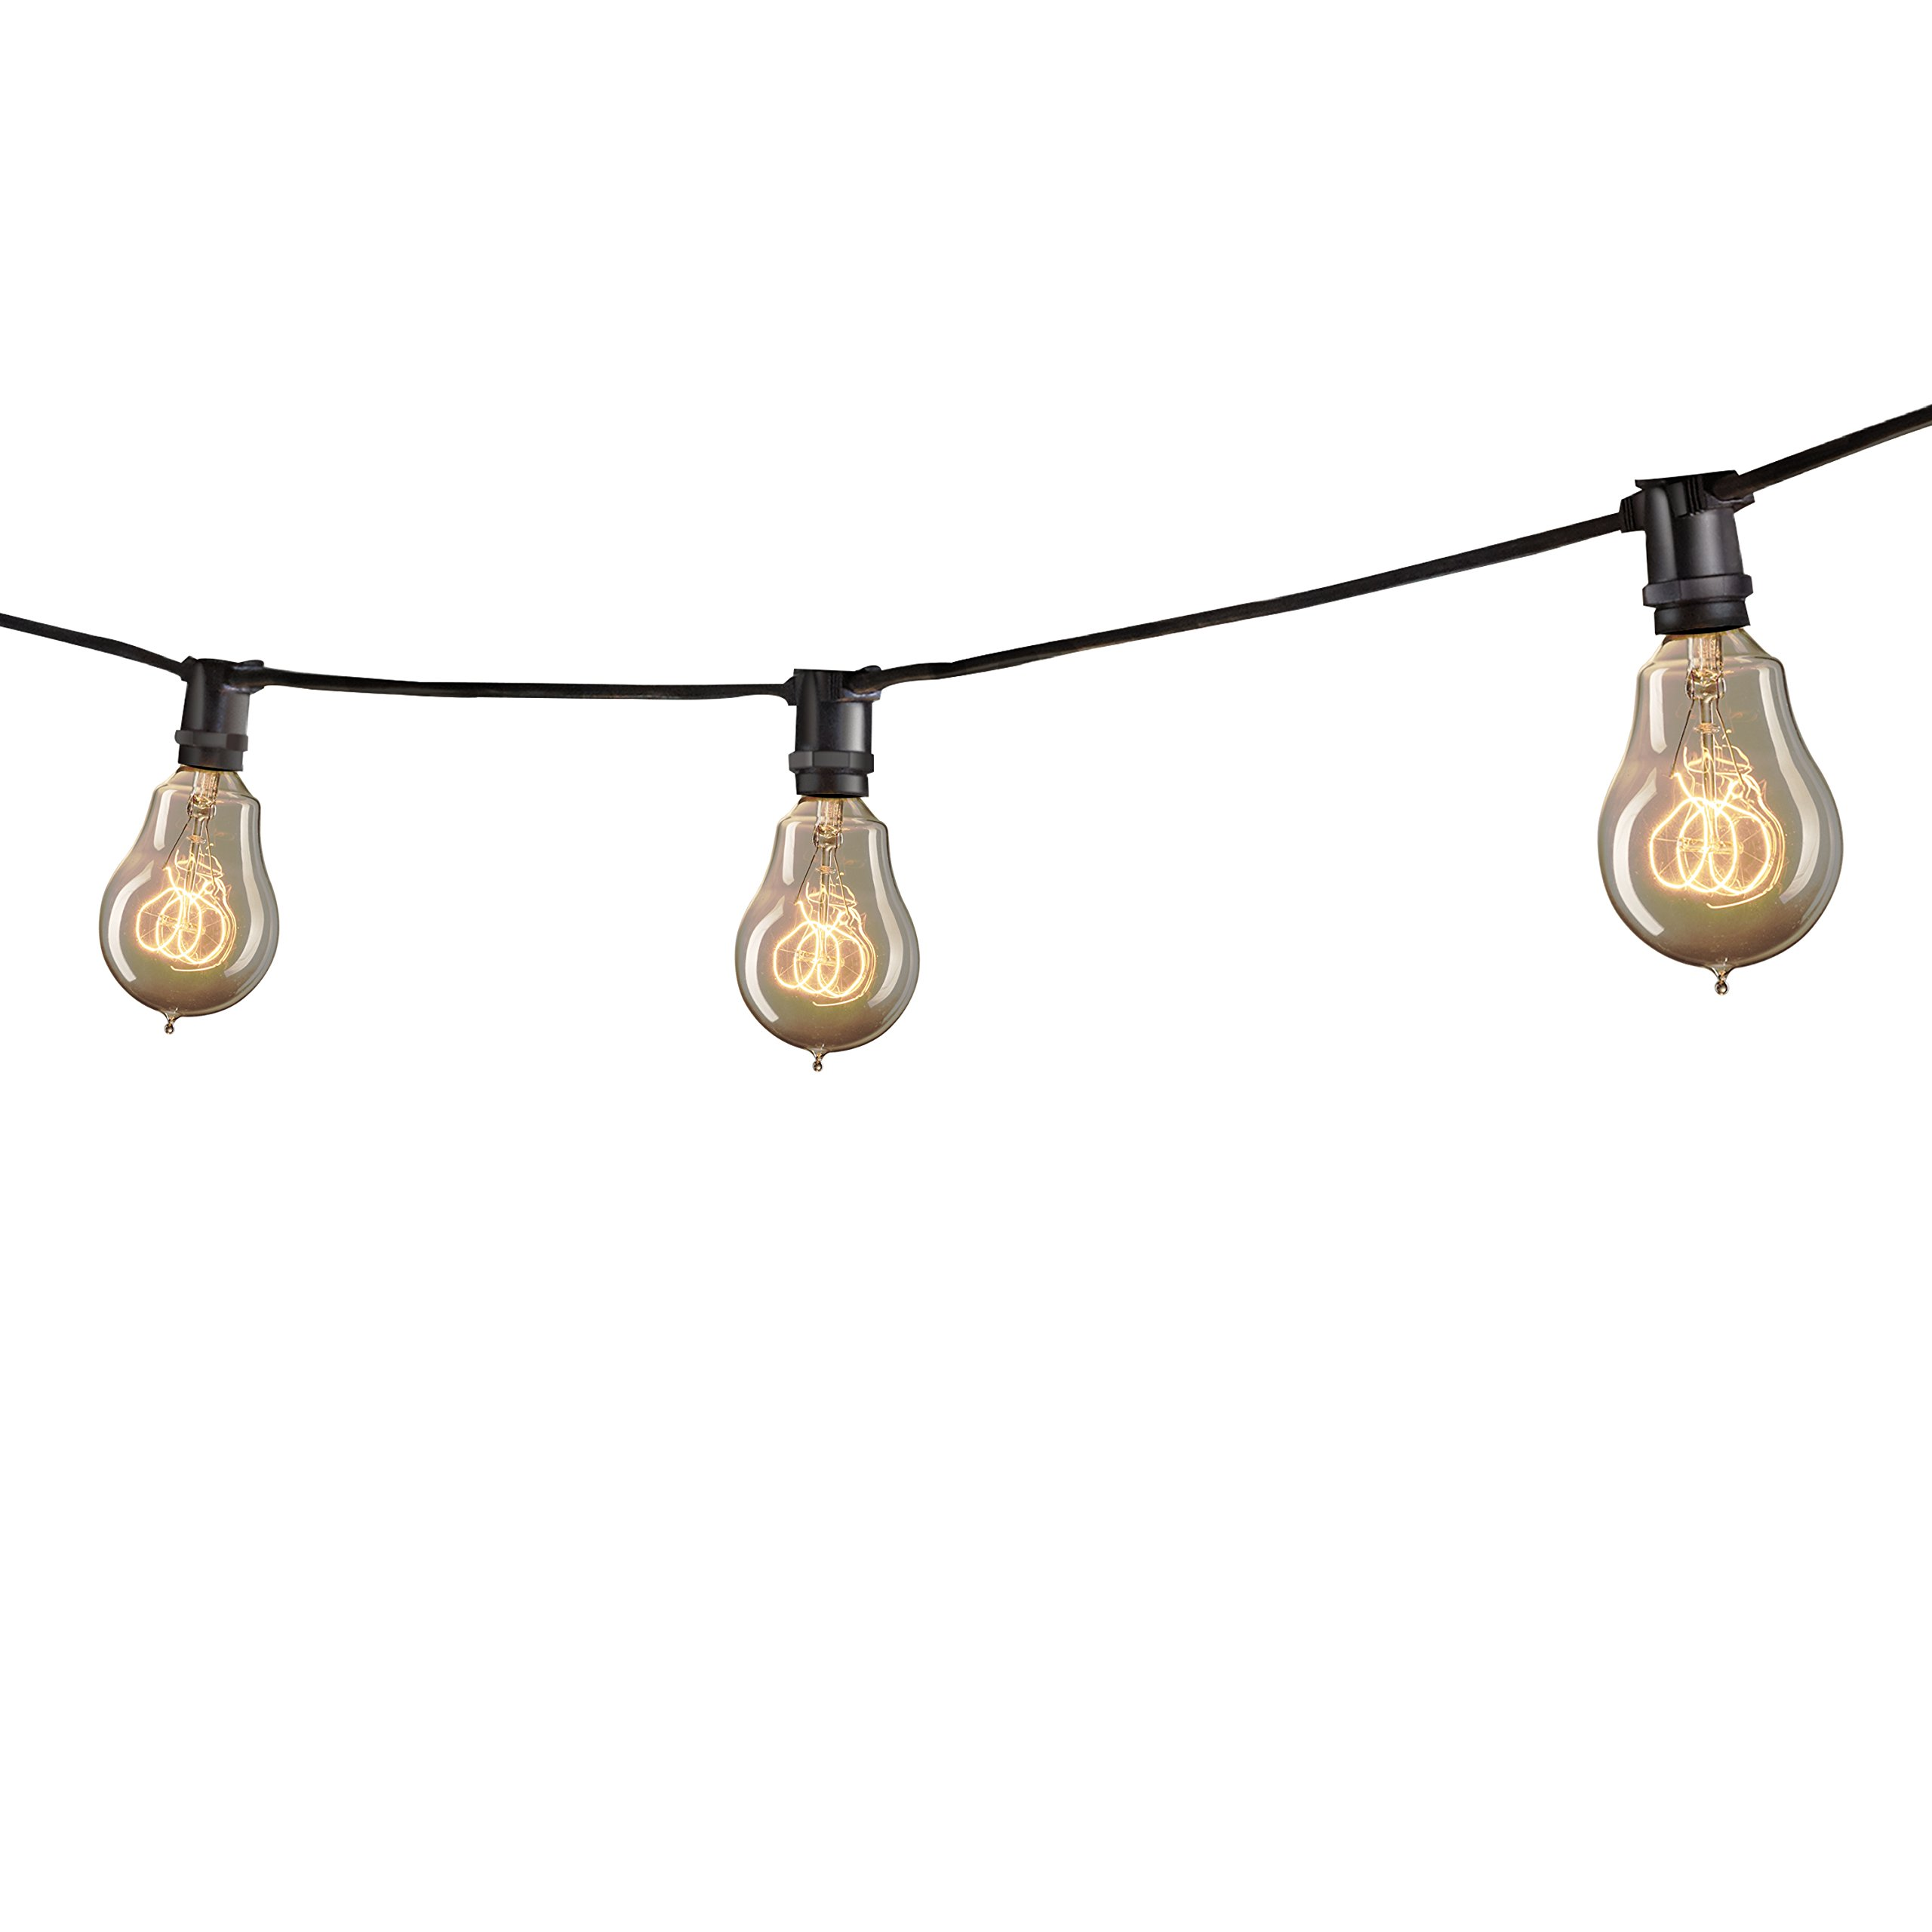 Bulbrite STRING15/E12/BLACK-NOSA15KT Outdoor Mini String Light w/Vintage Edison Bulbs, 25-Feet, 15 Lights Sockets, Black